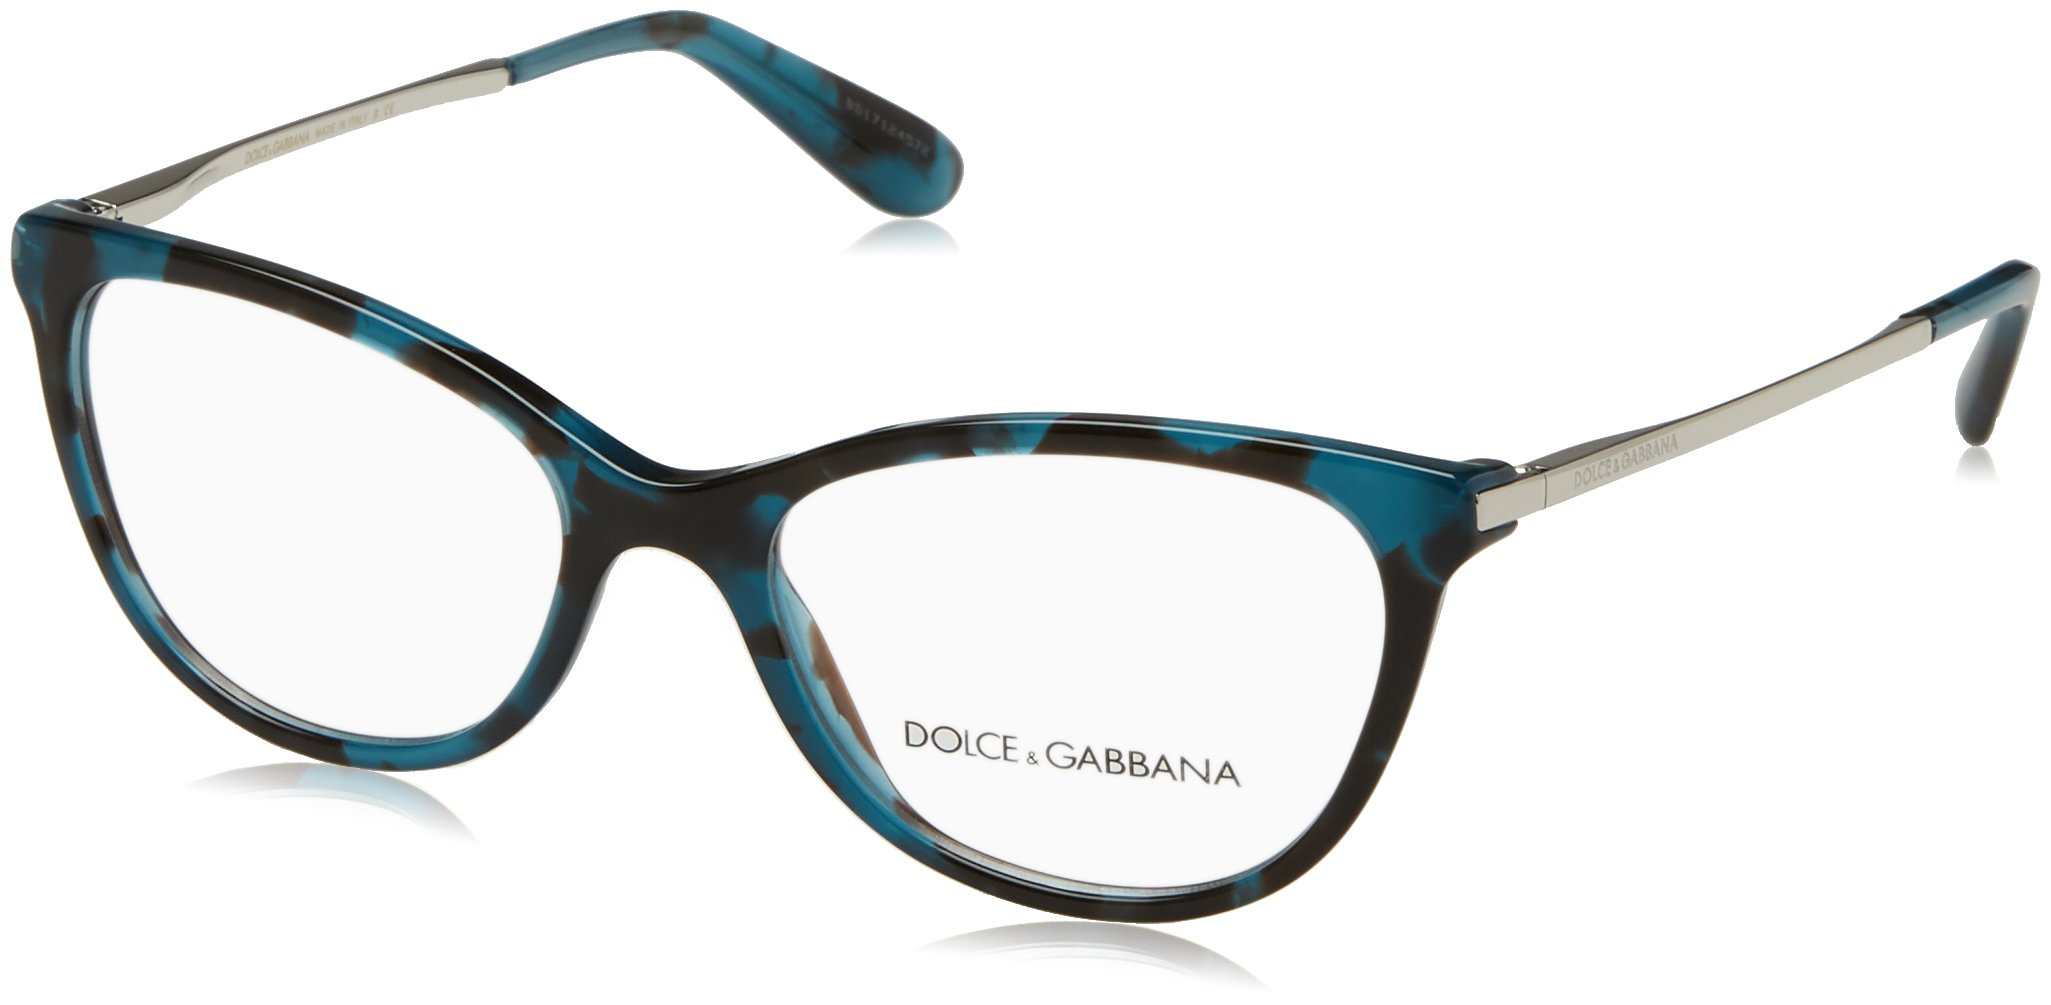 Dolce&Gabbana DG3258 Eyeglass Frames 2887-52 - Petrolemu Cube DG3258-2887-52